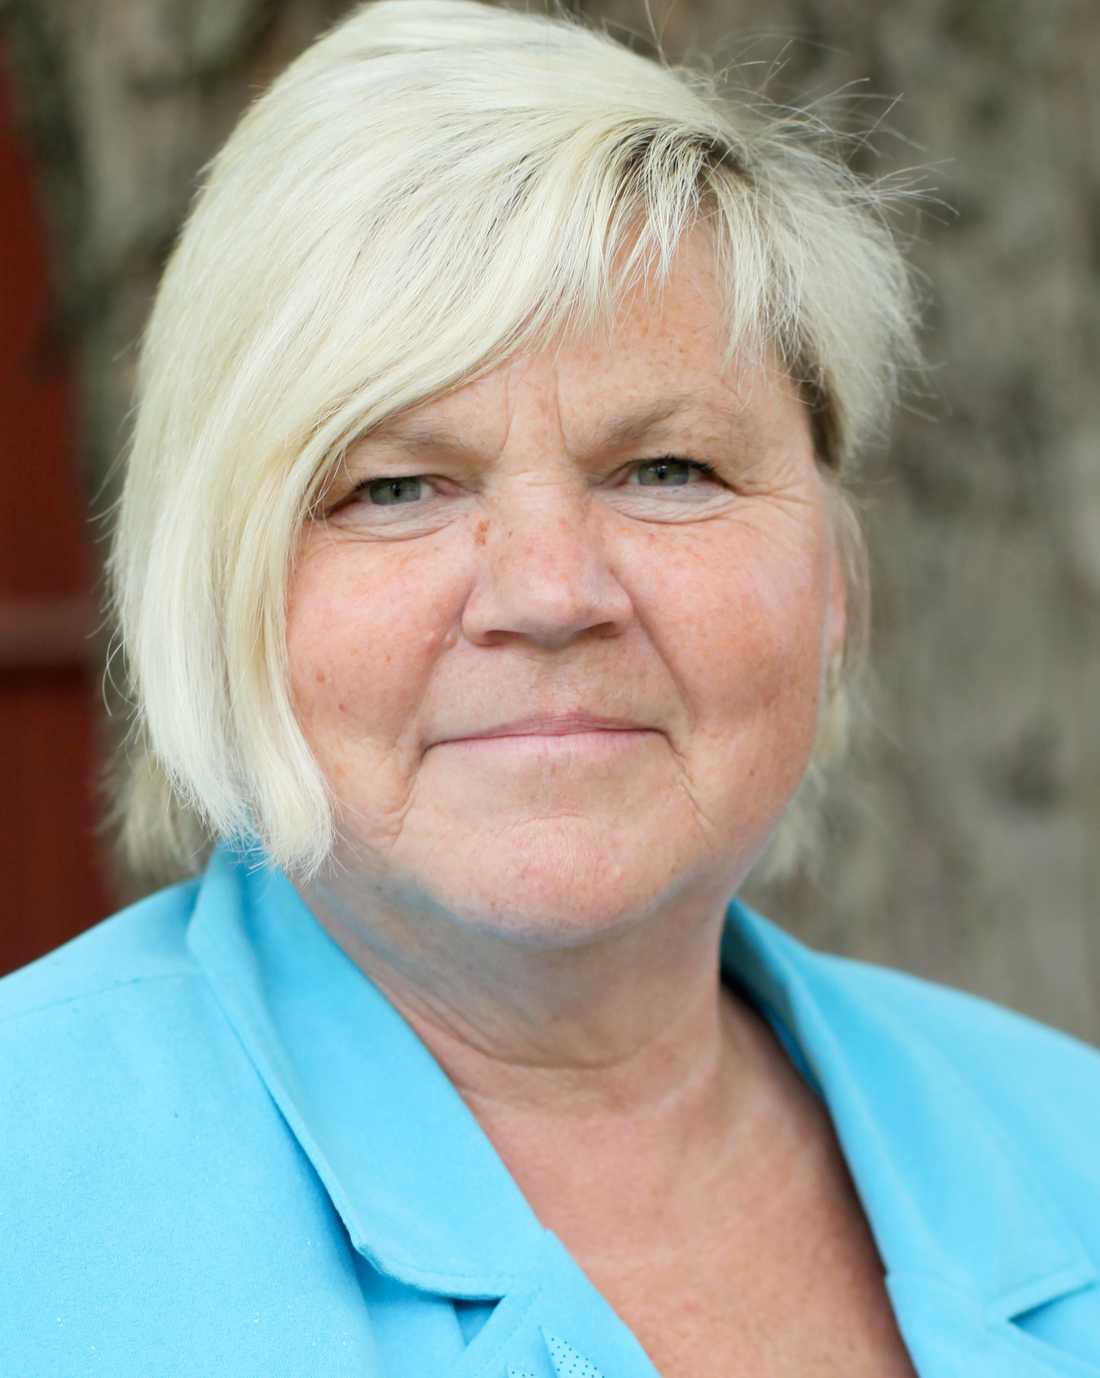 Lena Melesjö Windahl (S).